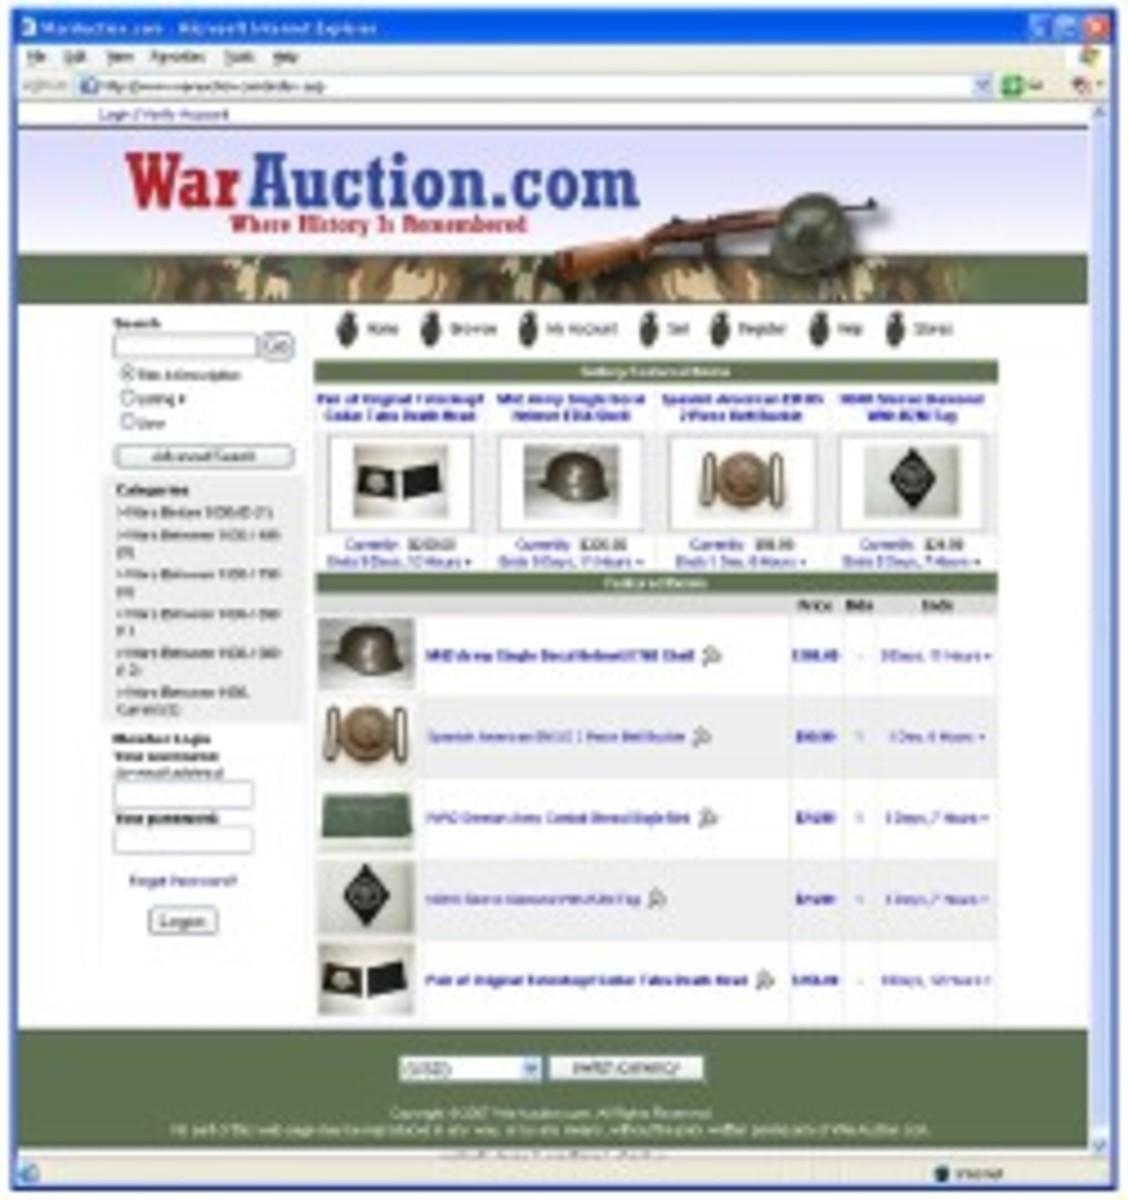 WarAuctionscreenshot_1.jpg